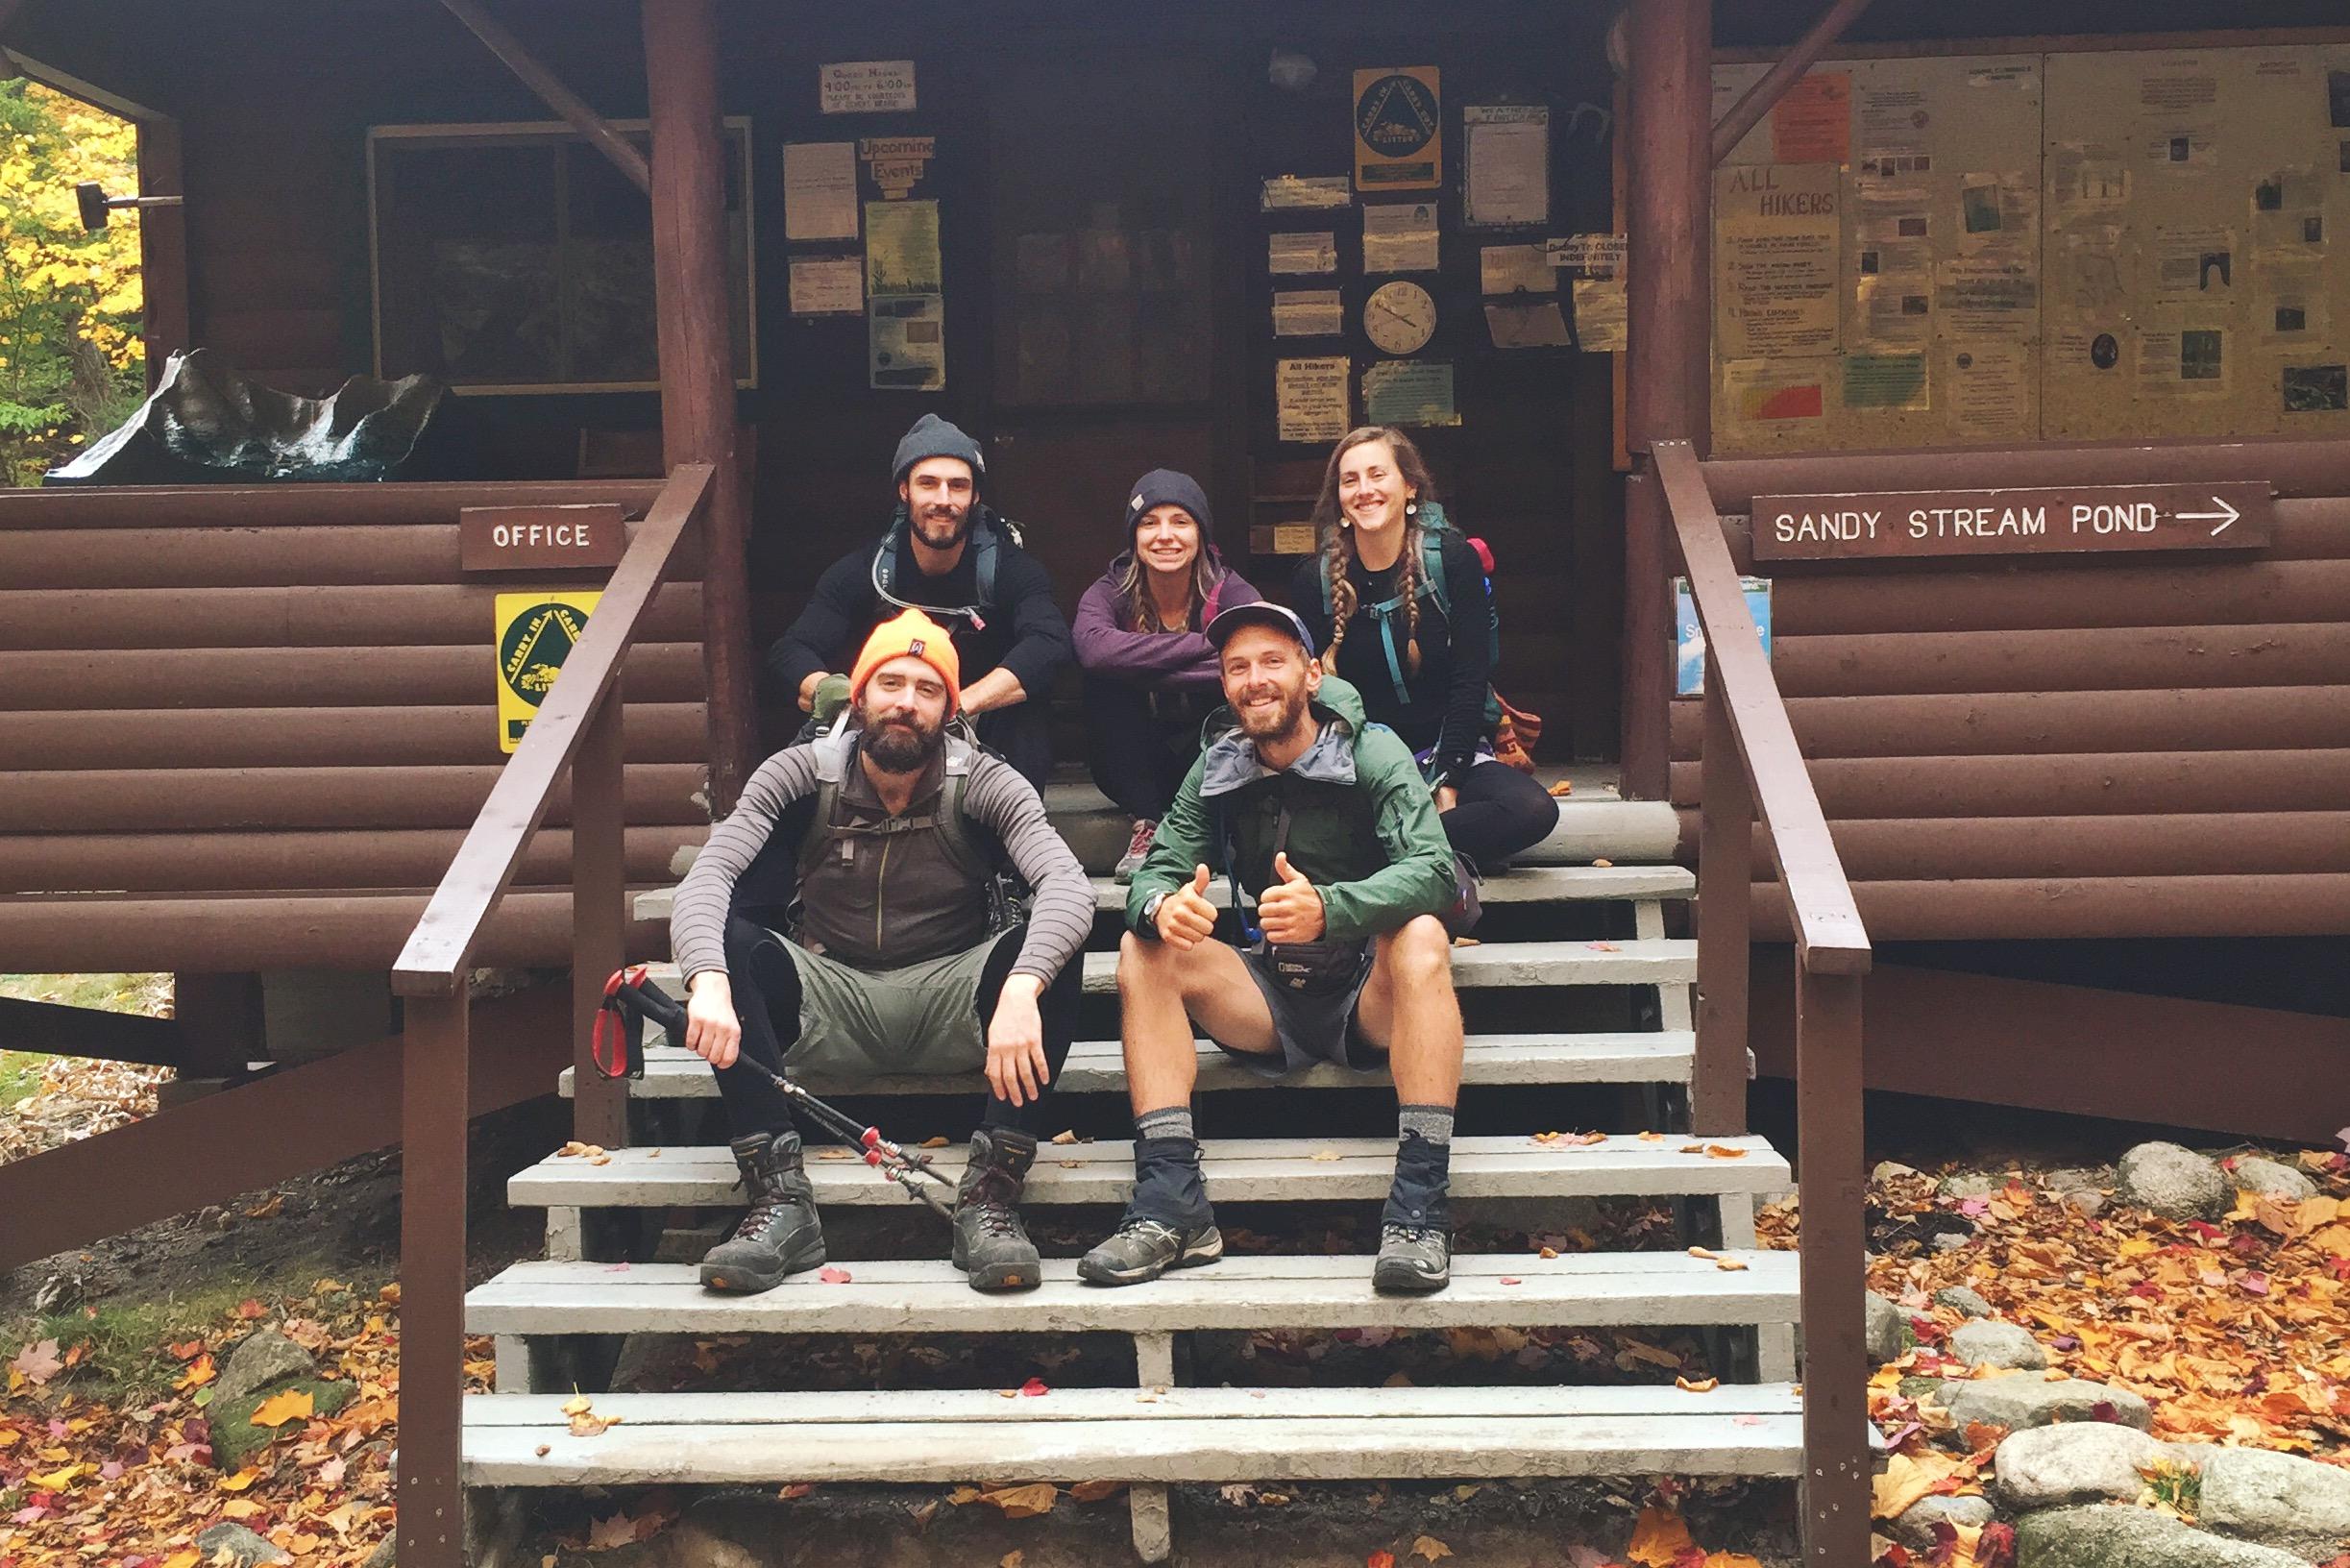 Alpine, Moose, Twirls, Fin, and Teton